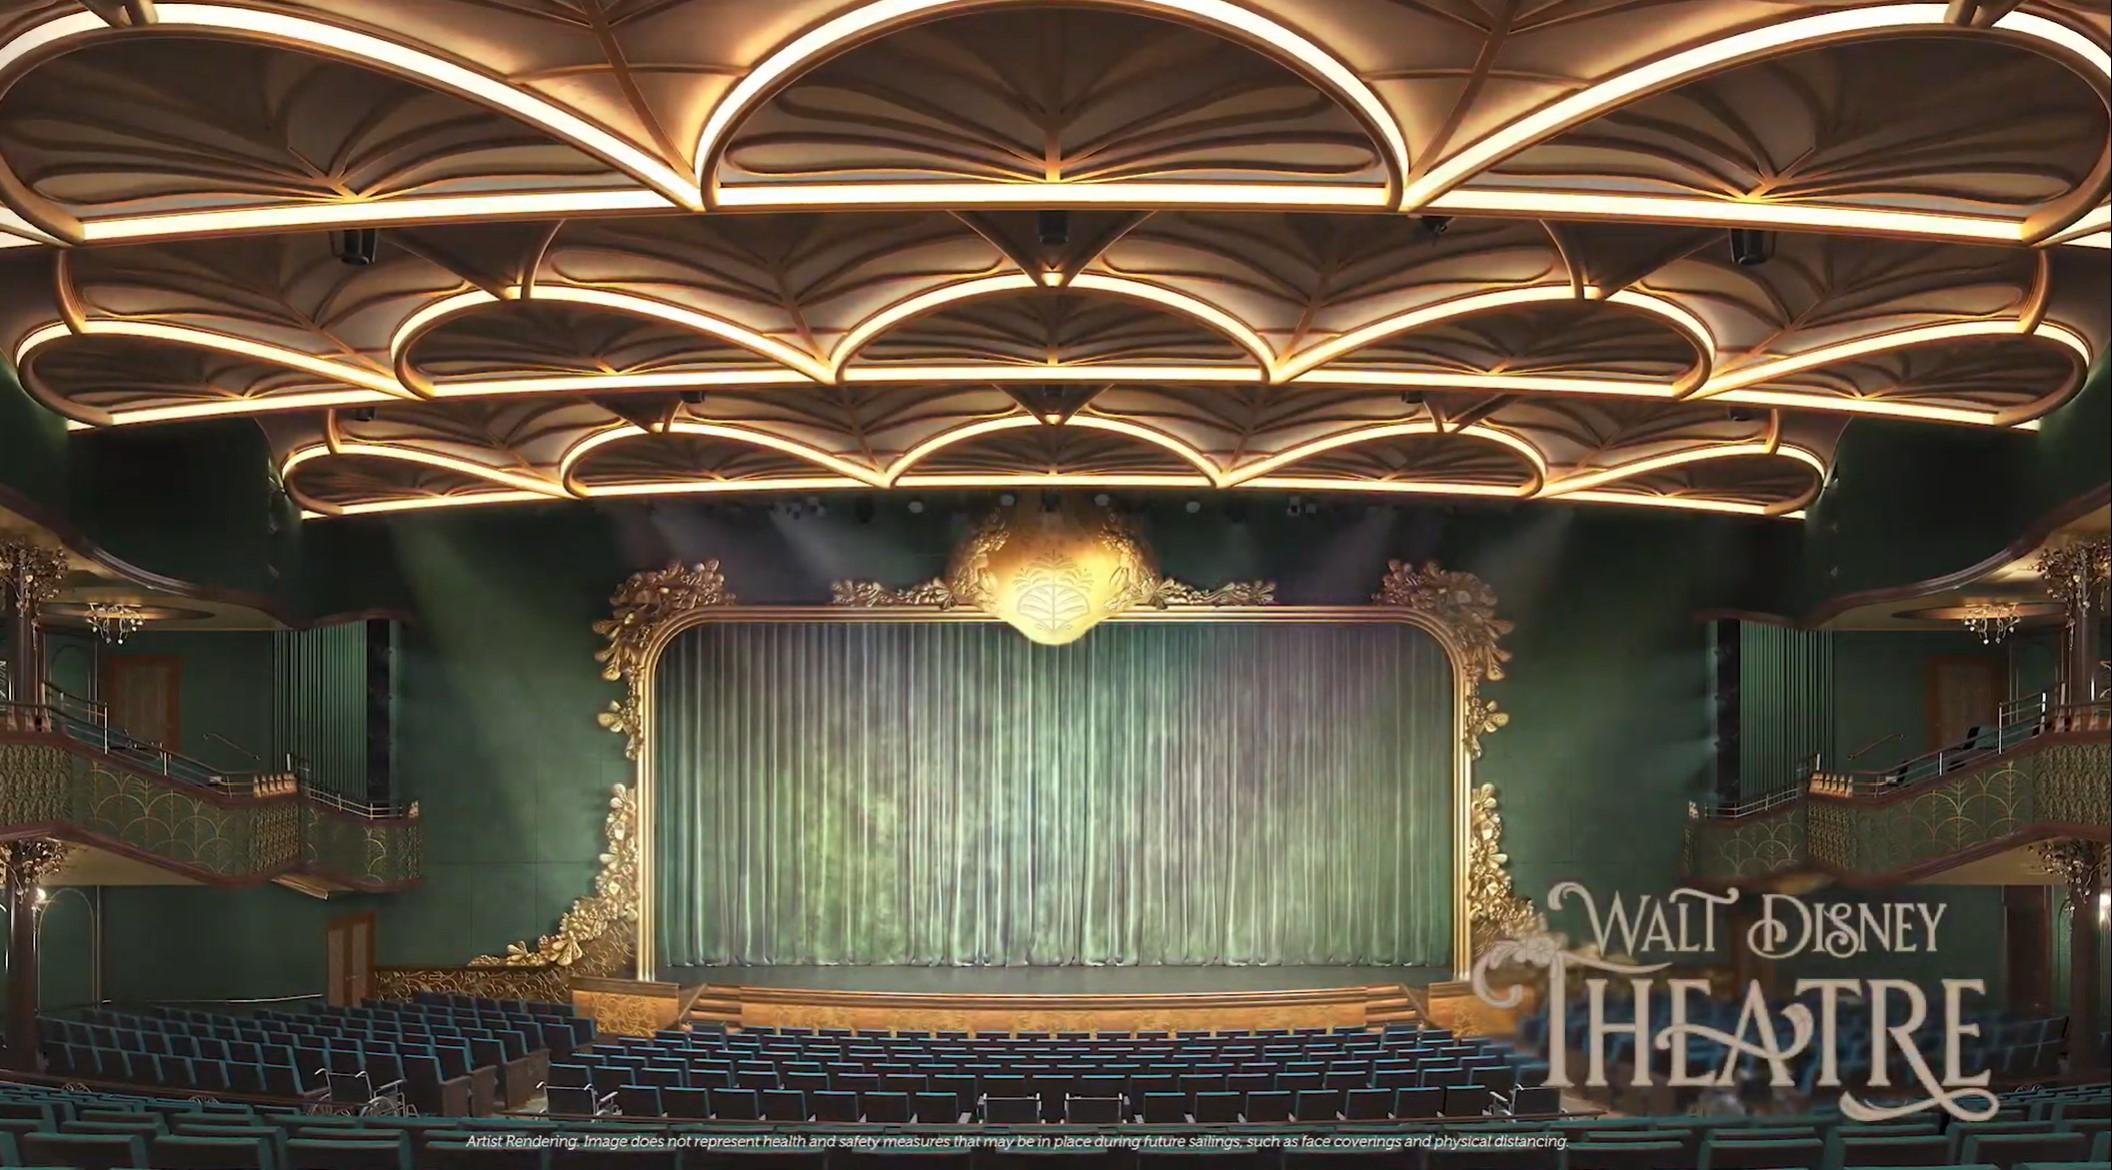 Walt Disney Theatre Wish